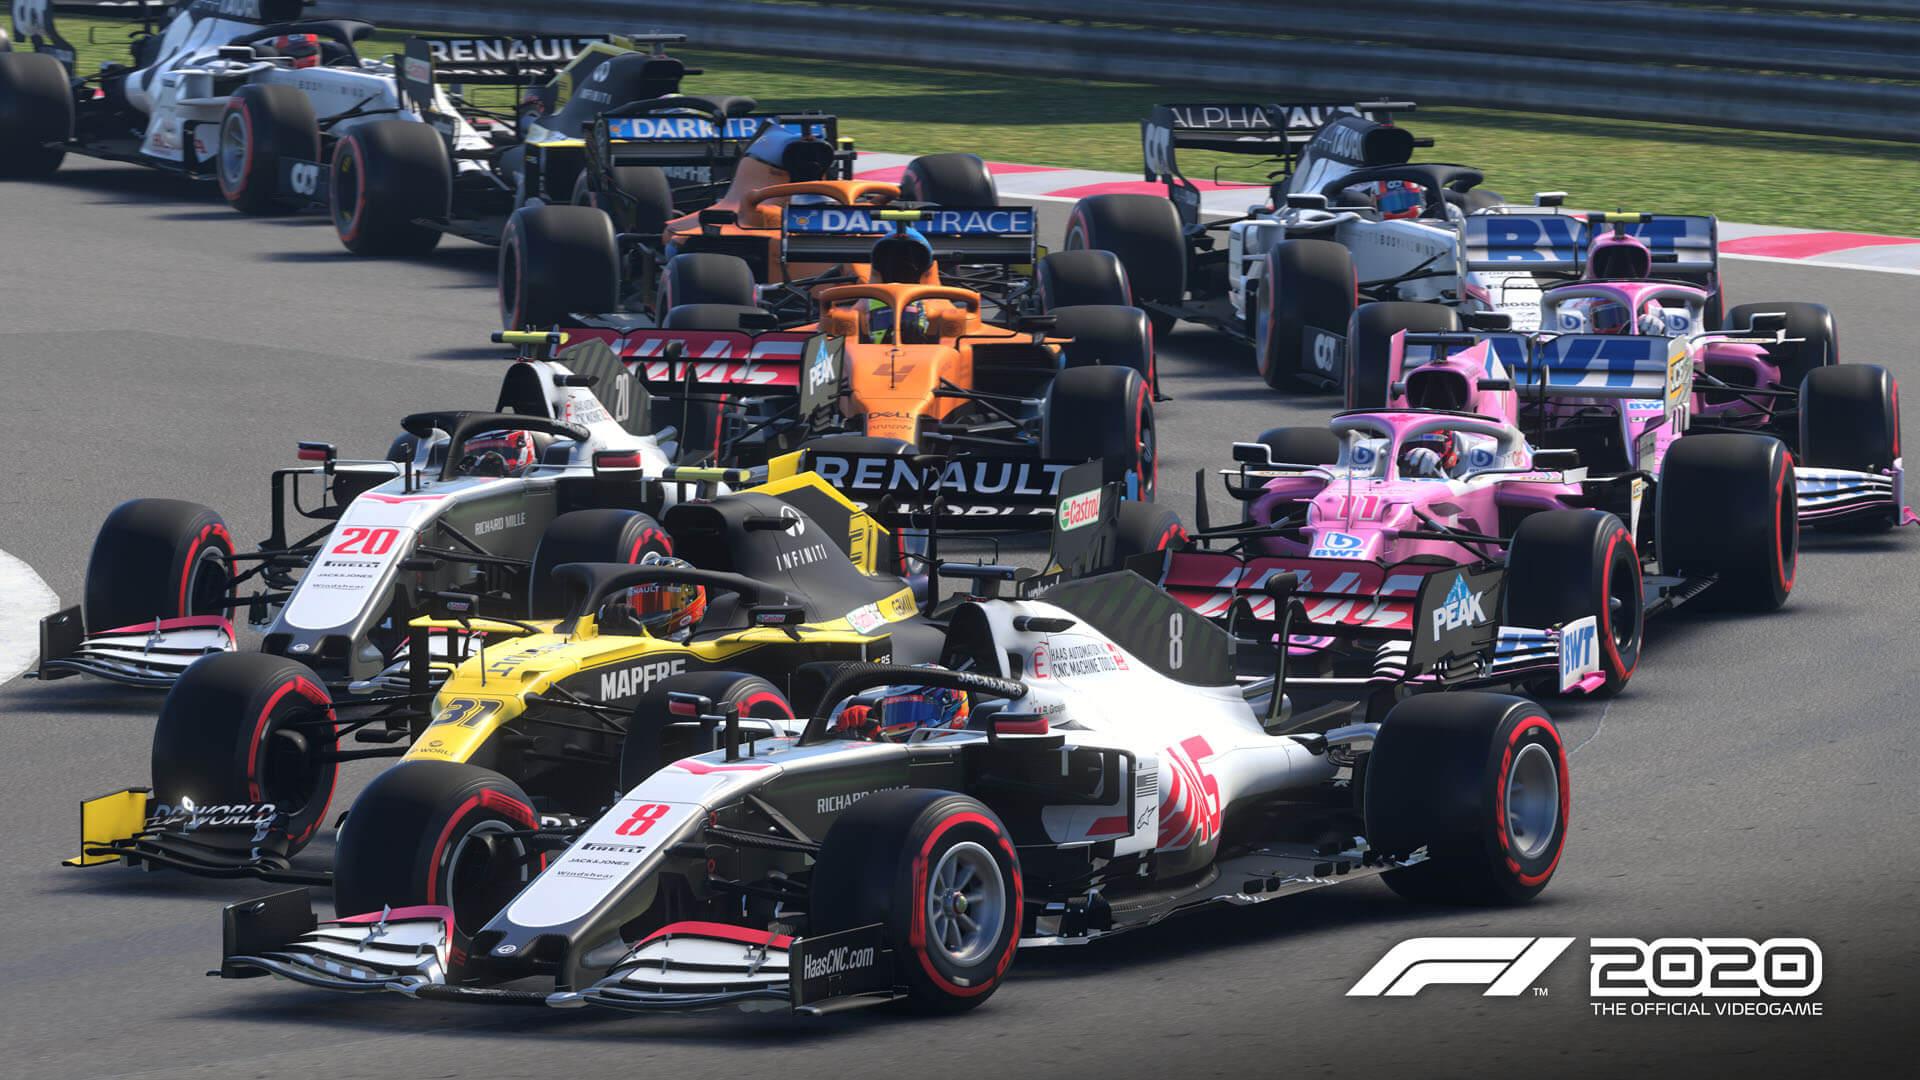 Renault F1 Sport Formula One Team Auto Car Motor Automobile Racing Badge Patch